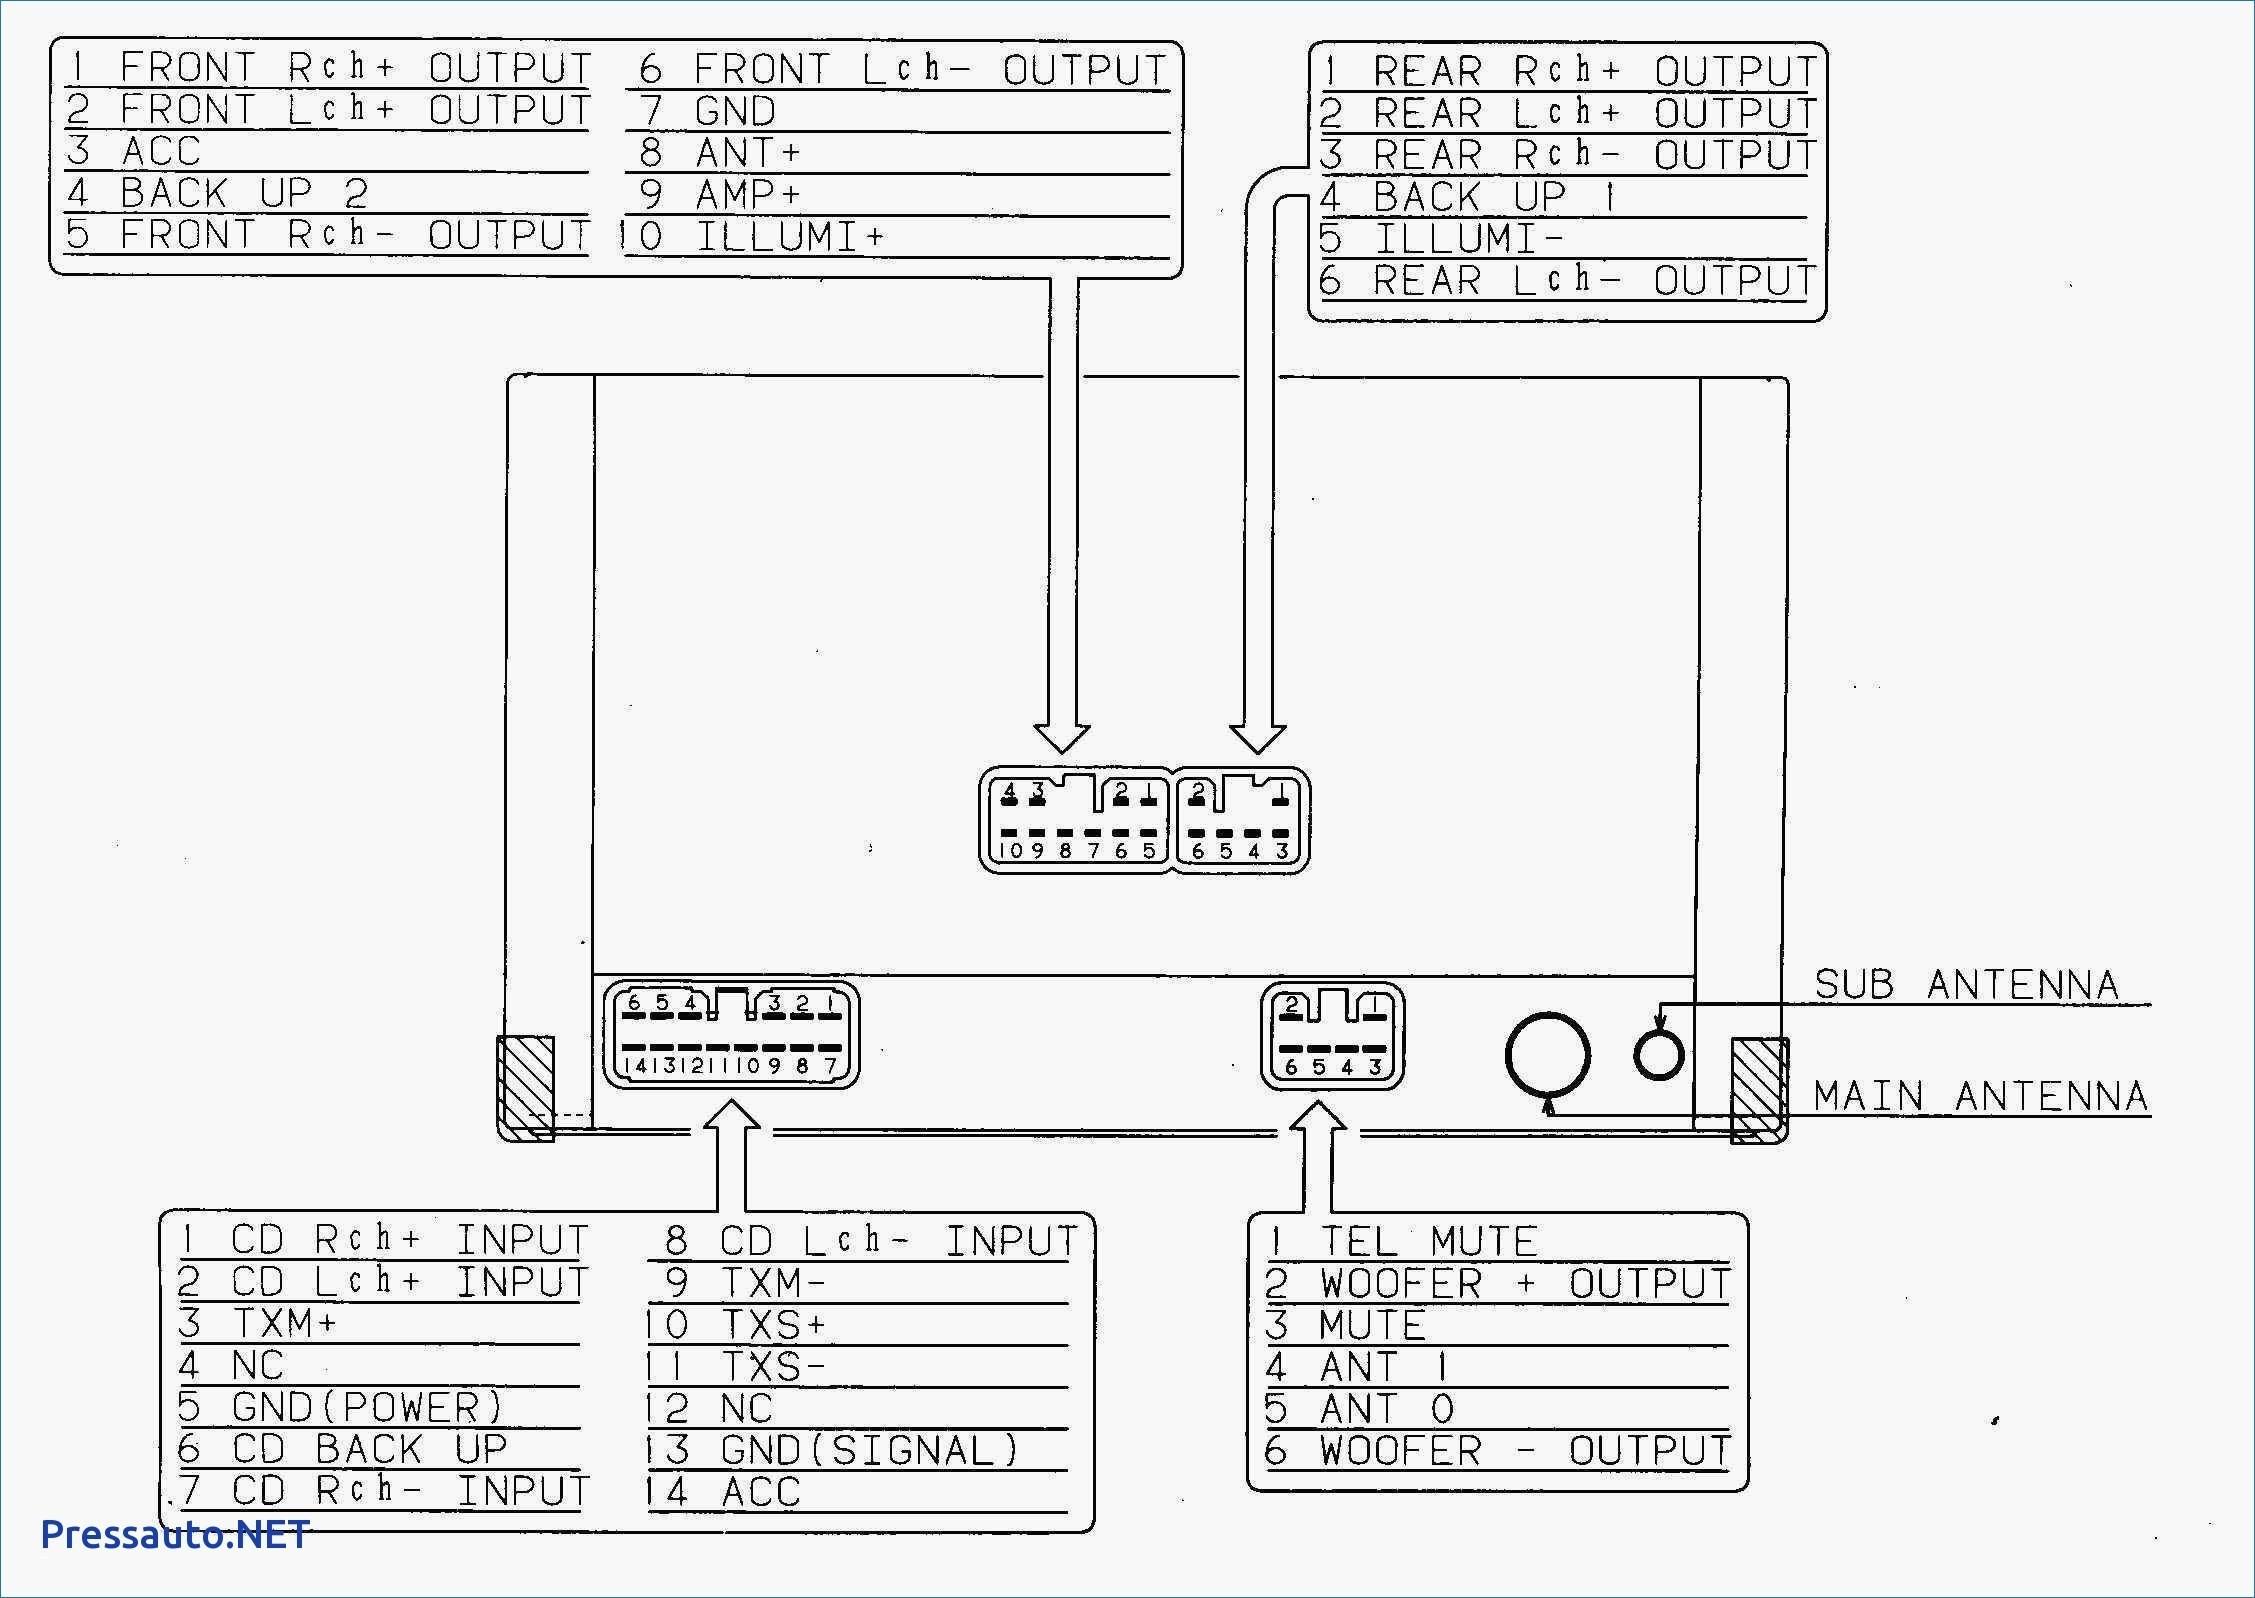 sony cdx gt06 wiring diagram car stereo simple electronic rh wiringdiagramone today Sony Xplod Car Stereo Wiring Diagram Sony Xplod Car Stereo Wiring Diagram